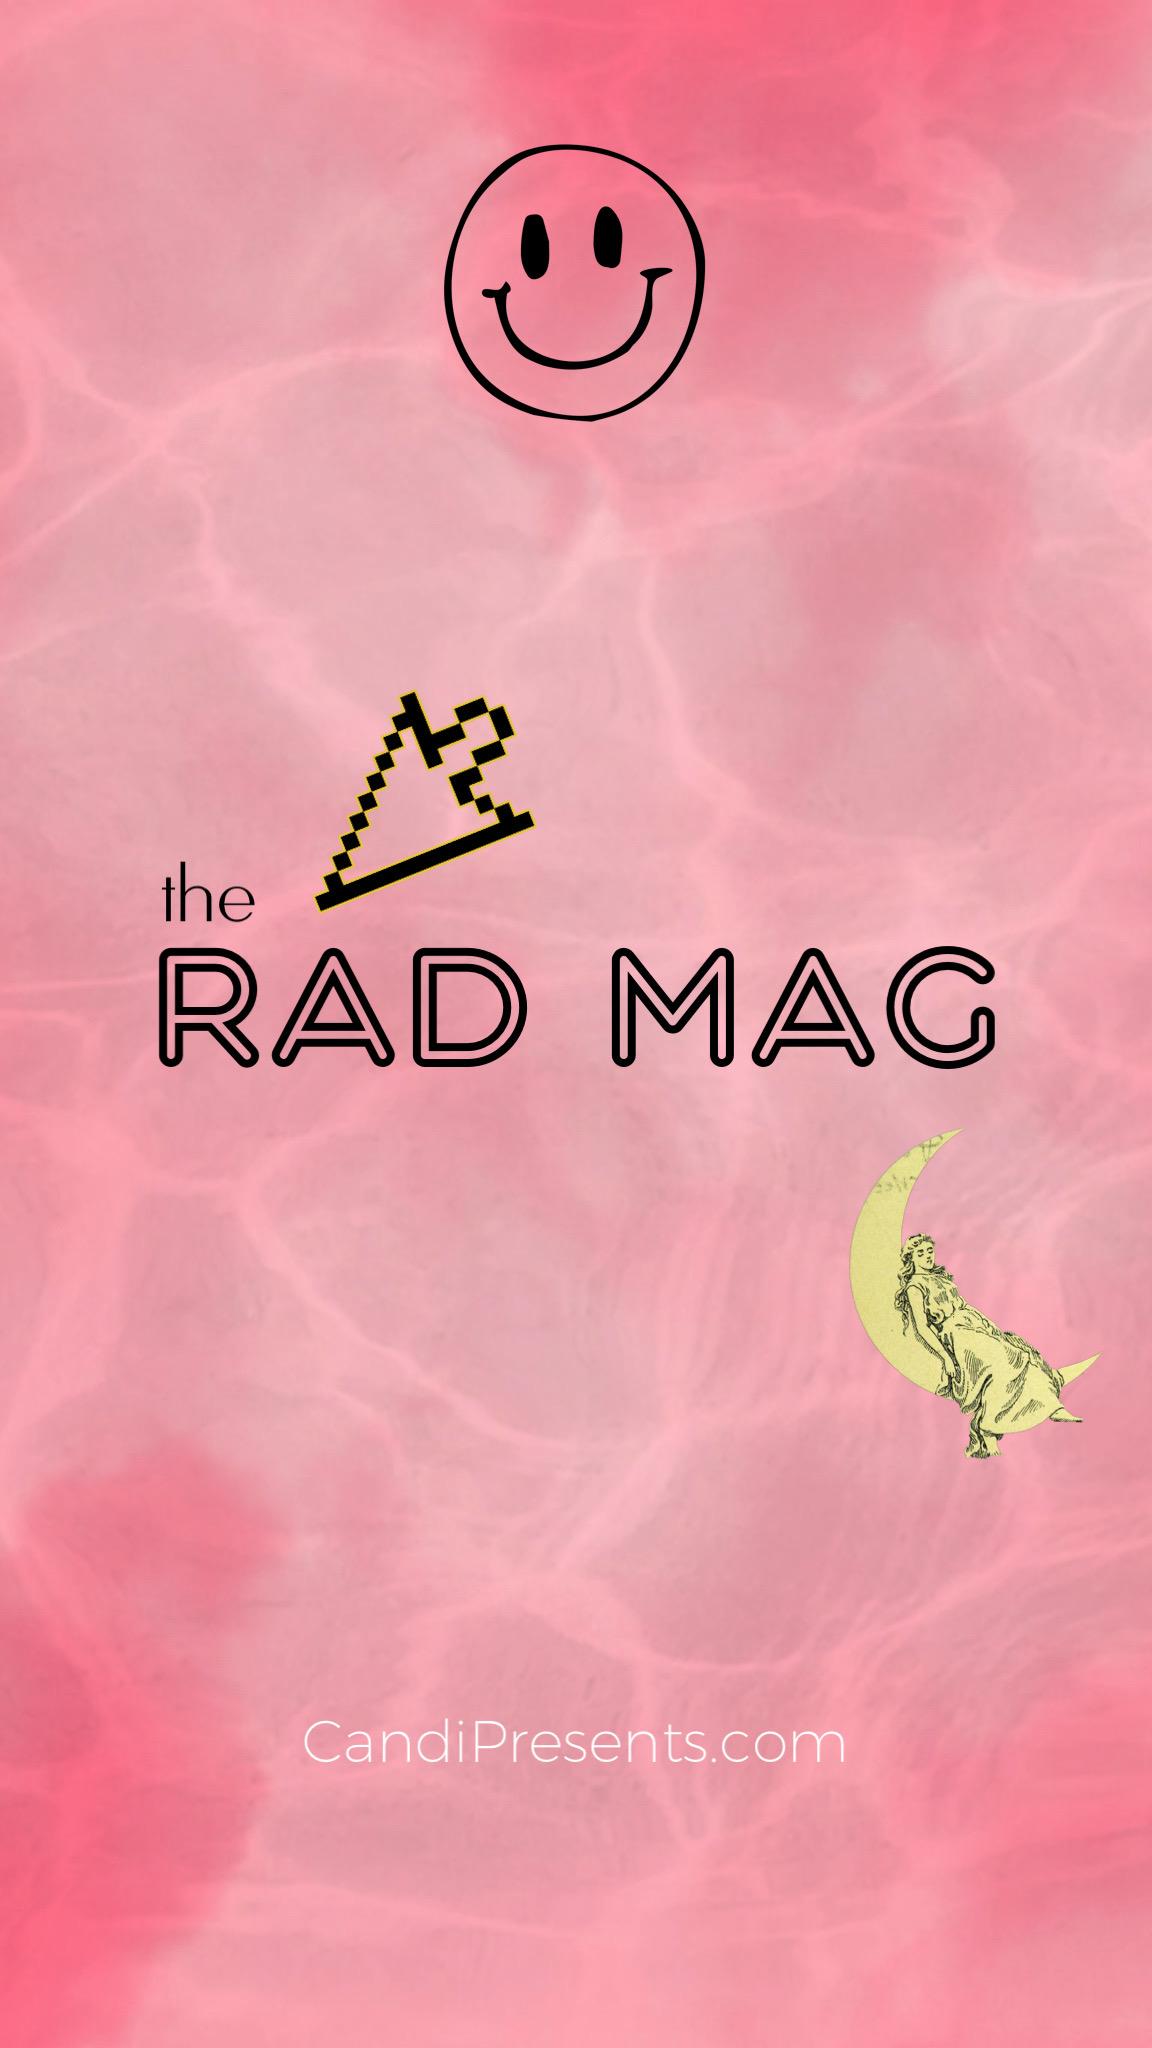 promo_ig story theRadMag